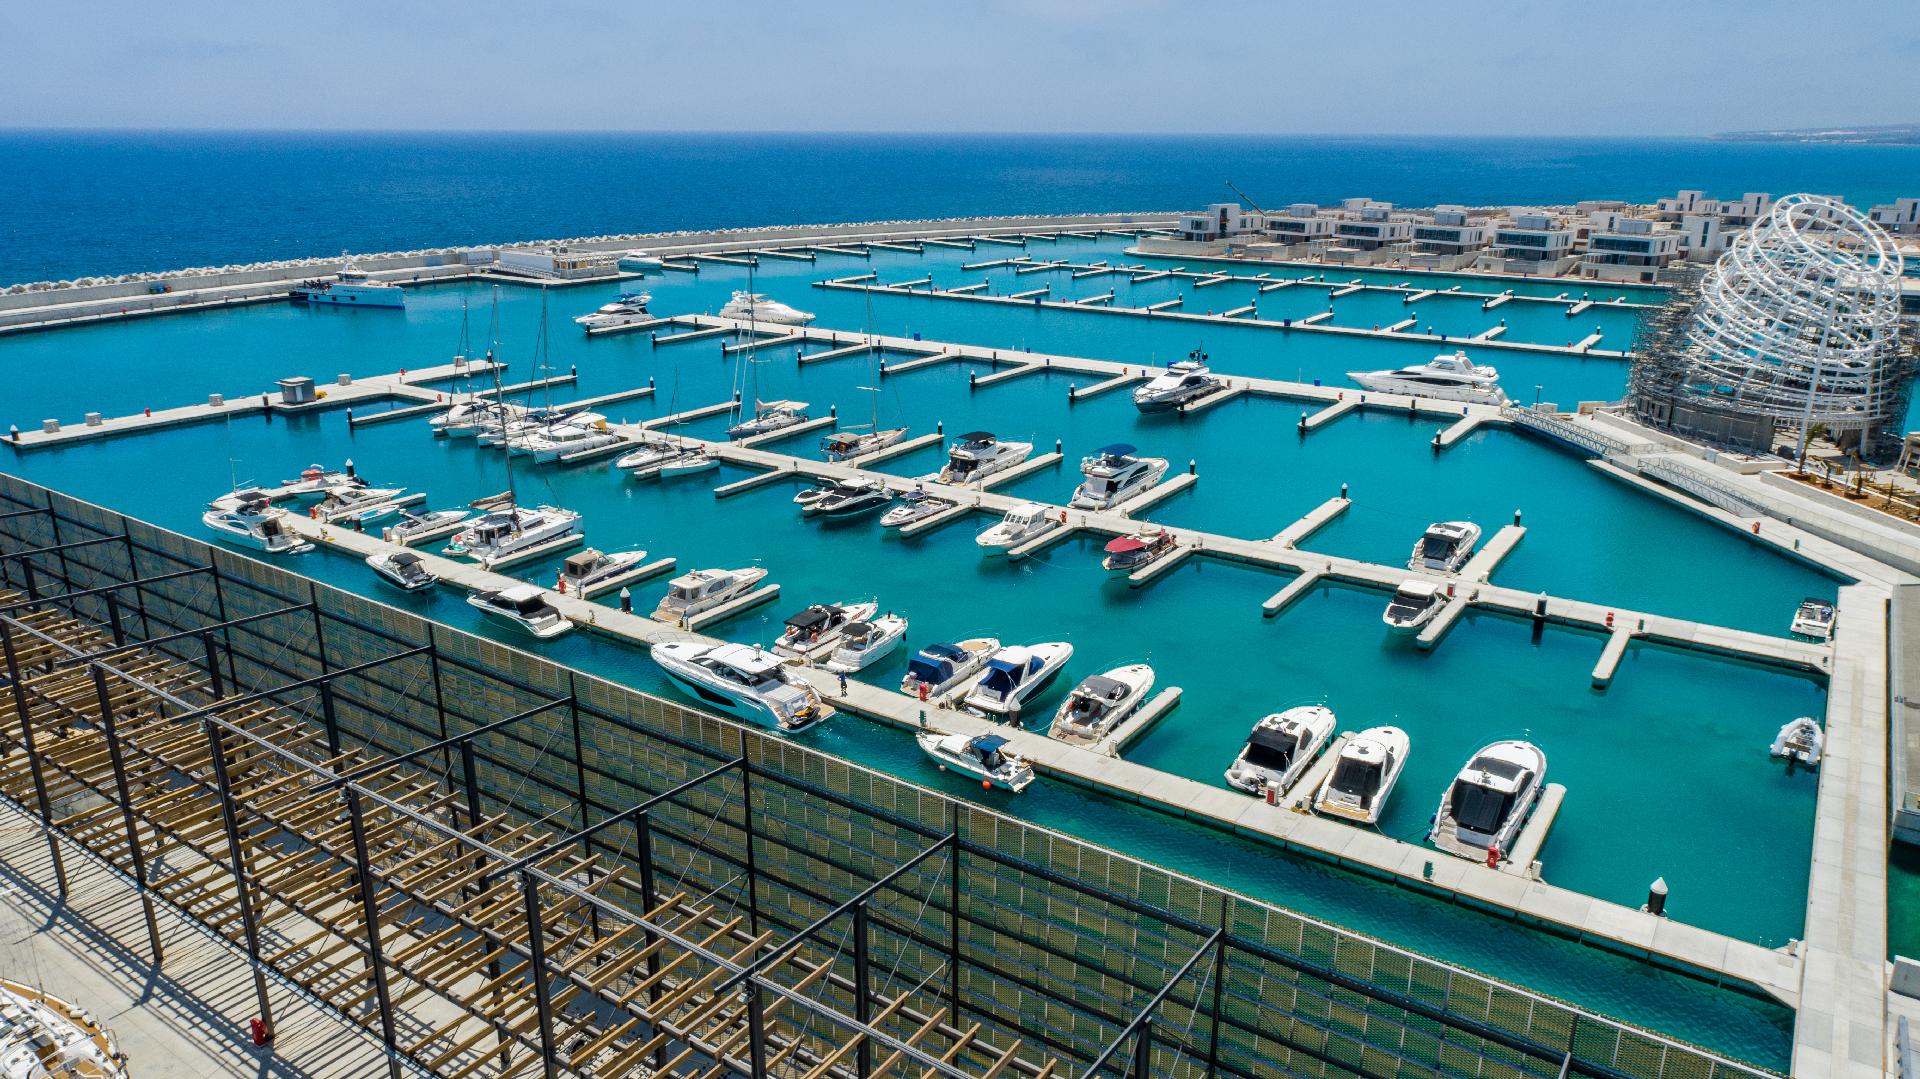 Ayia Napa Marina - Berthing Facilities